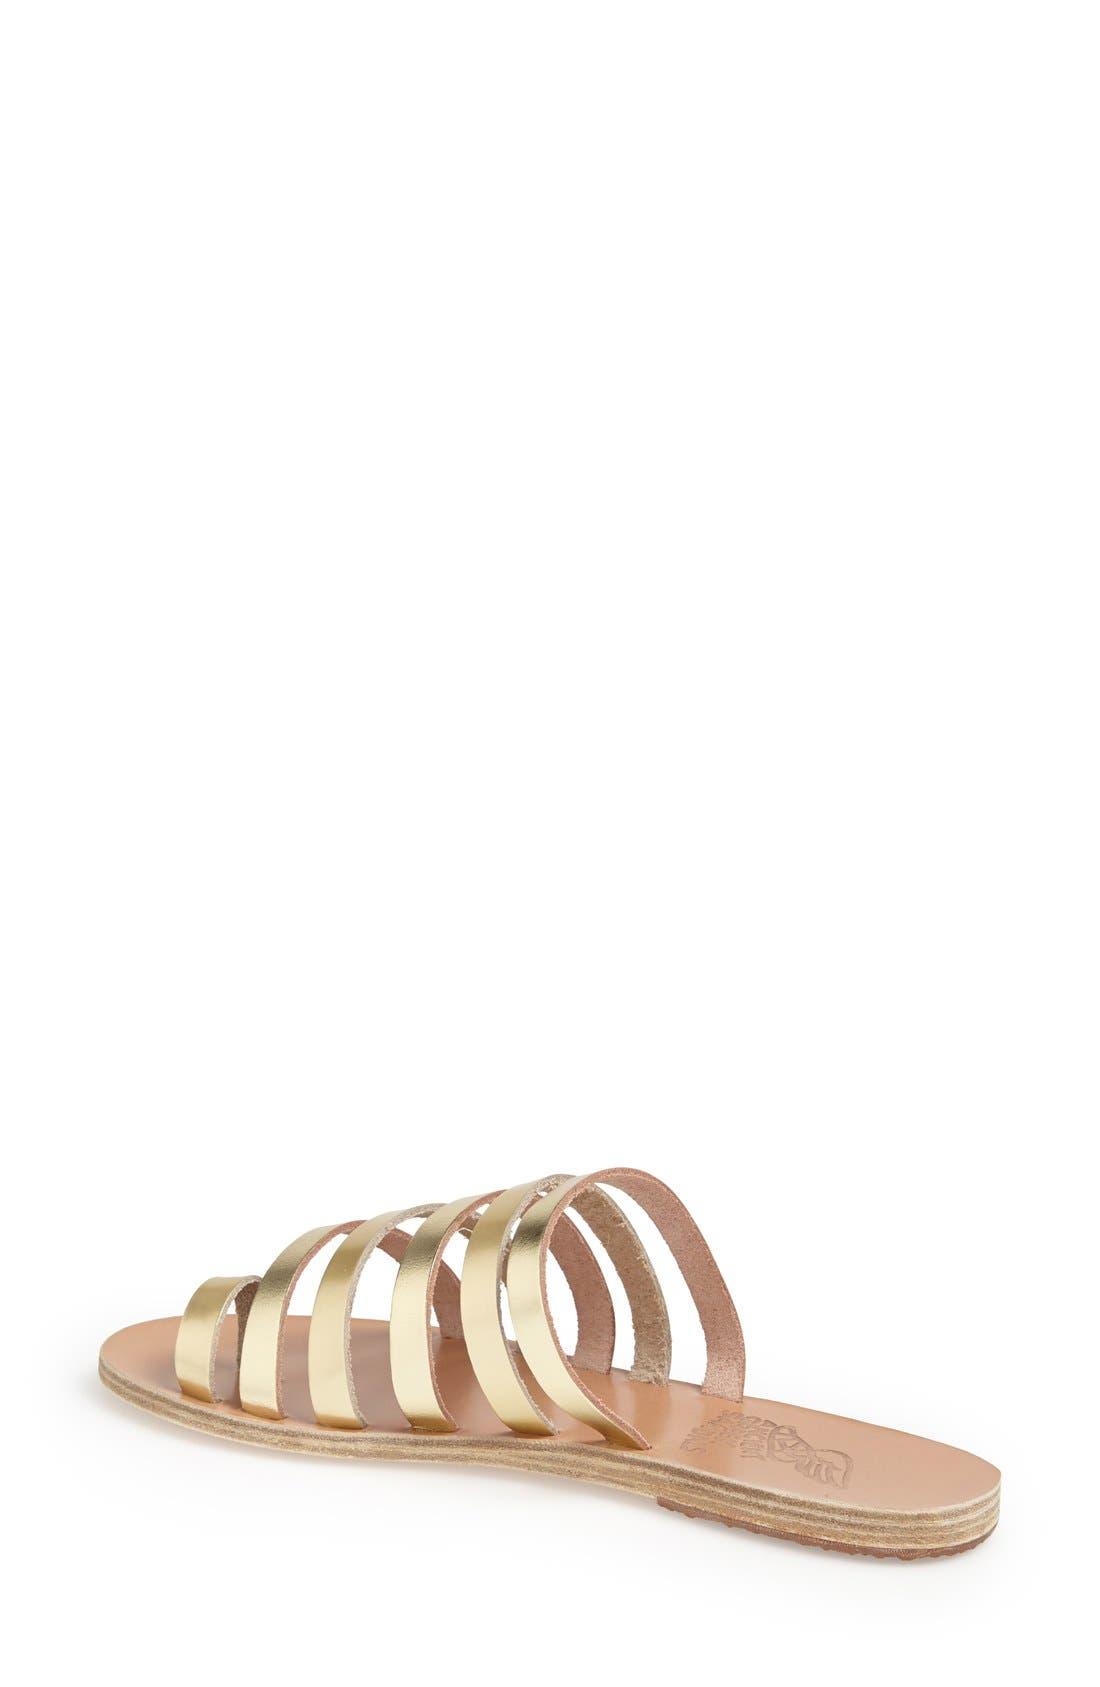 Alternate Image 2  - Ancient Greek Sandals 'Niki' Leather Sandal (Women)